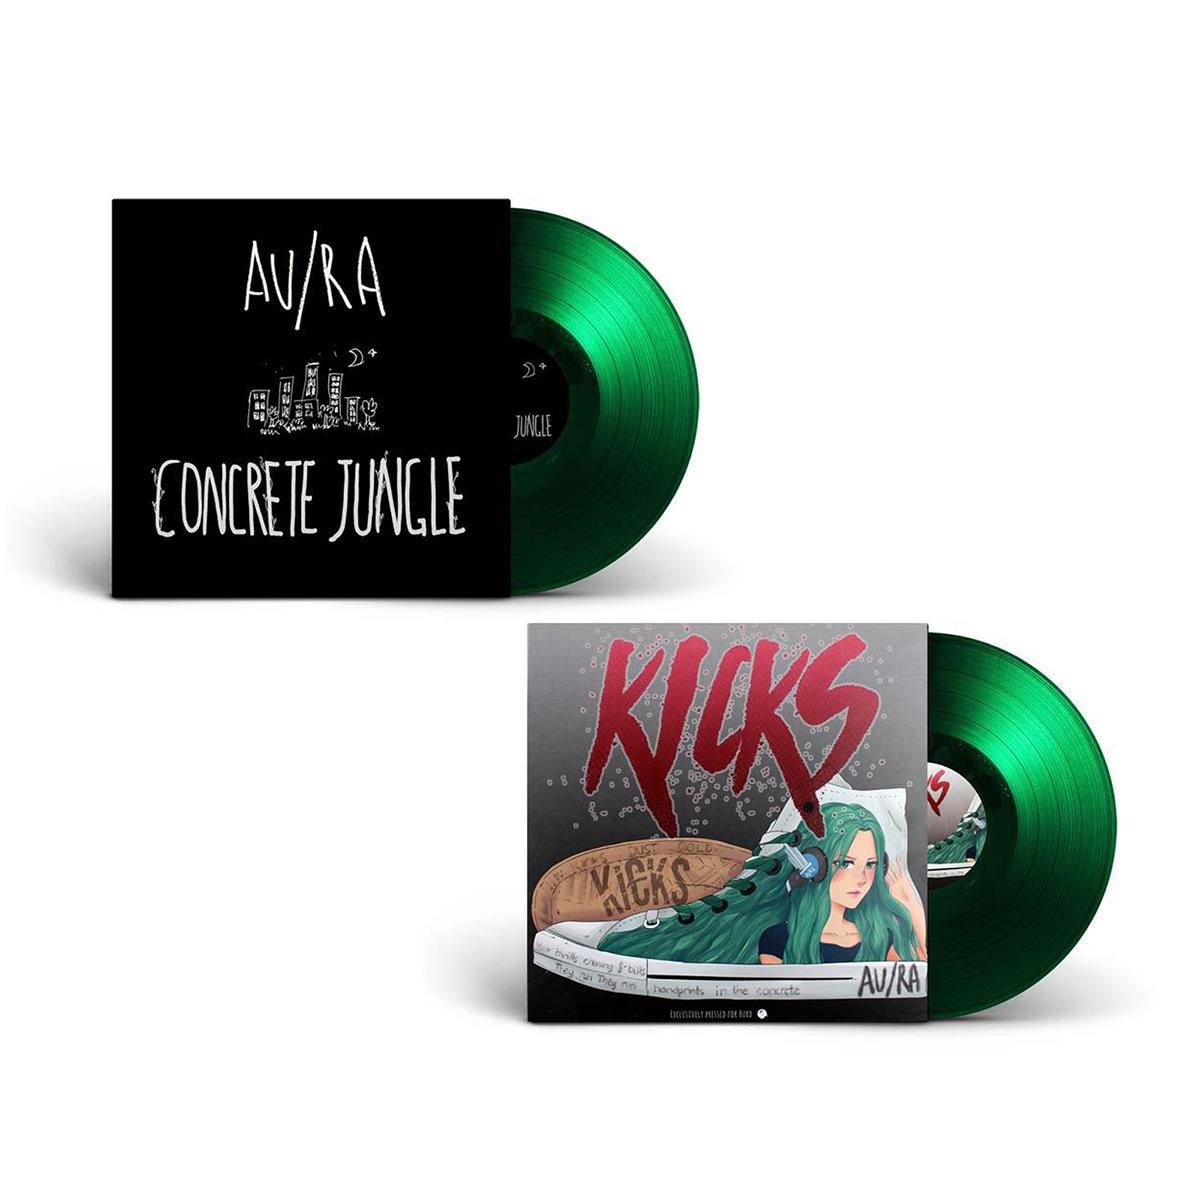 "Au/Ra Concrete Jungle/Kicks 7"" Vinyl"